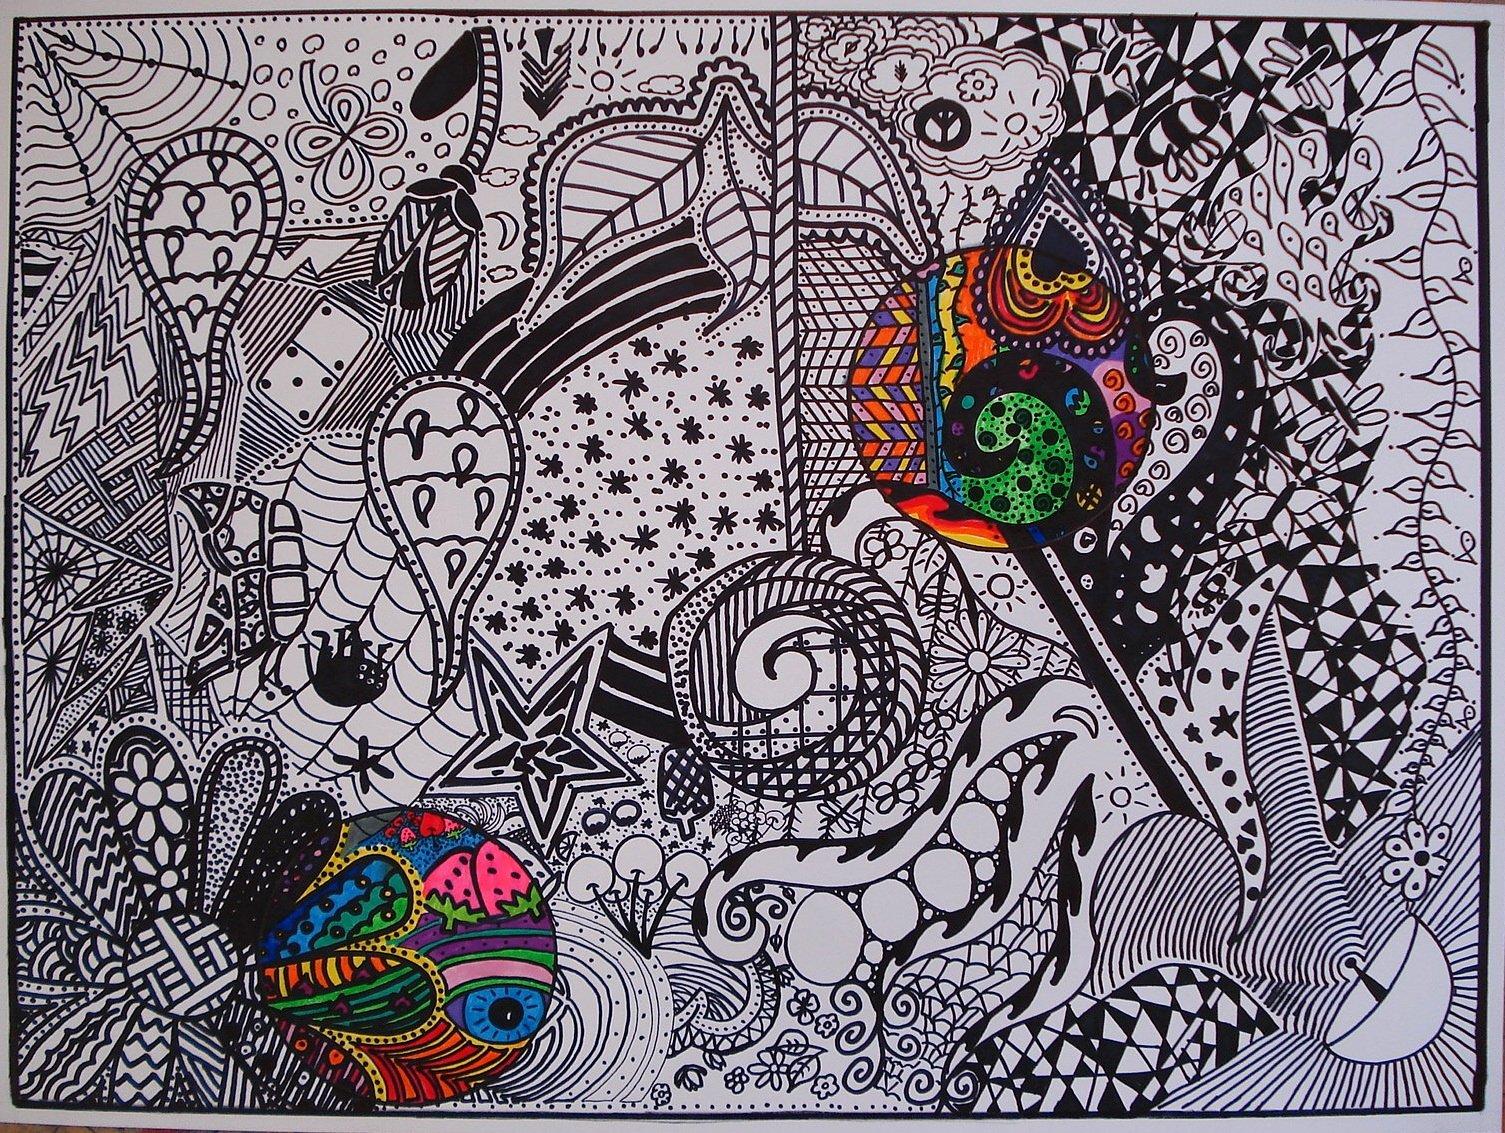 Black and White Designs Art Elegant Art Sub Lessons Black and White Doodle Design